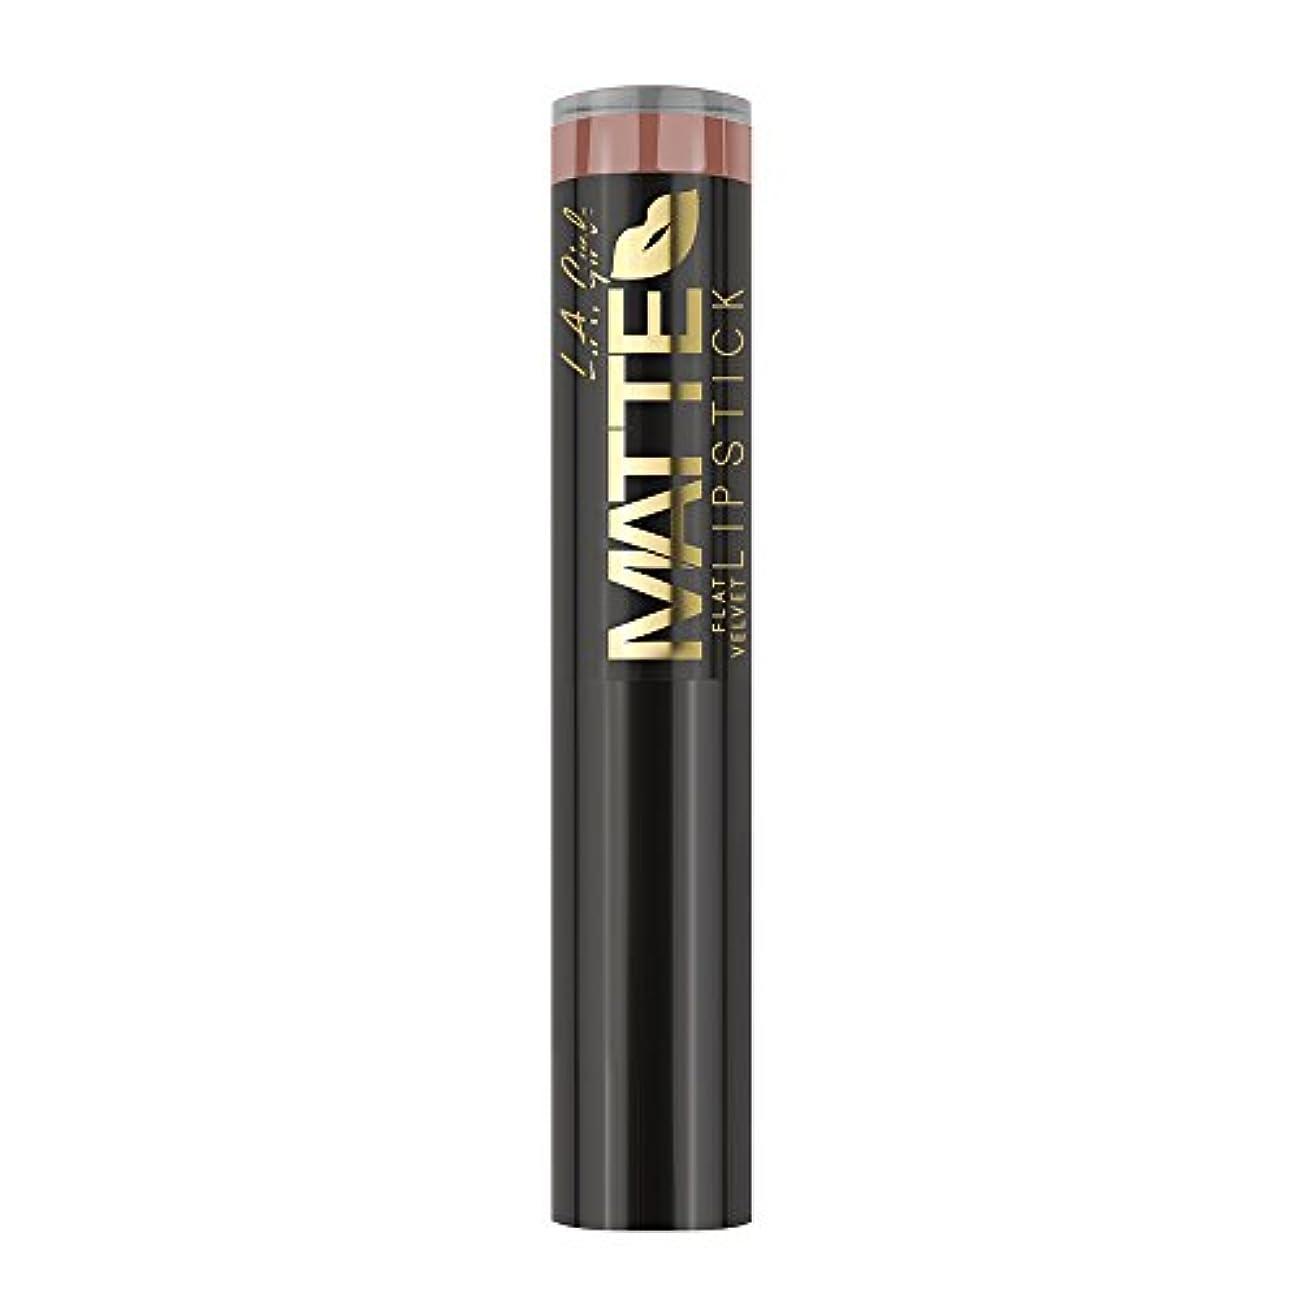 L.A. GIRL Matte Flat Velvet Lipstick Snuggle (並行輸入品)